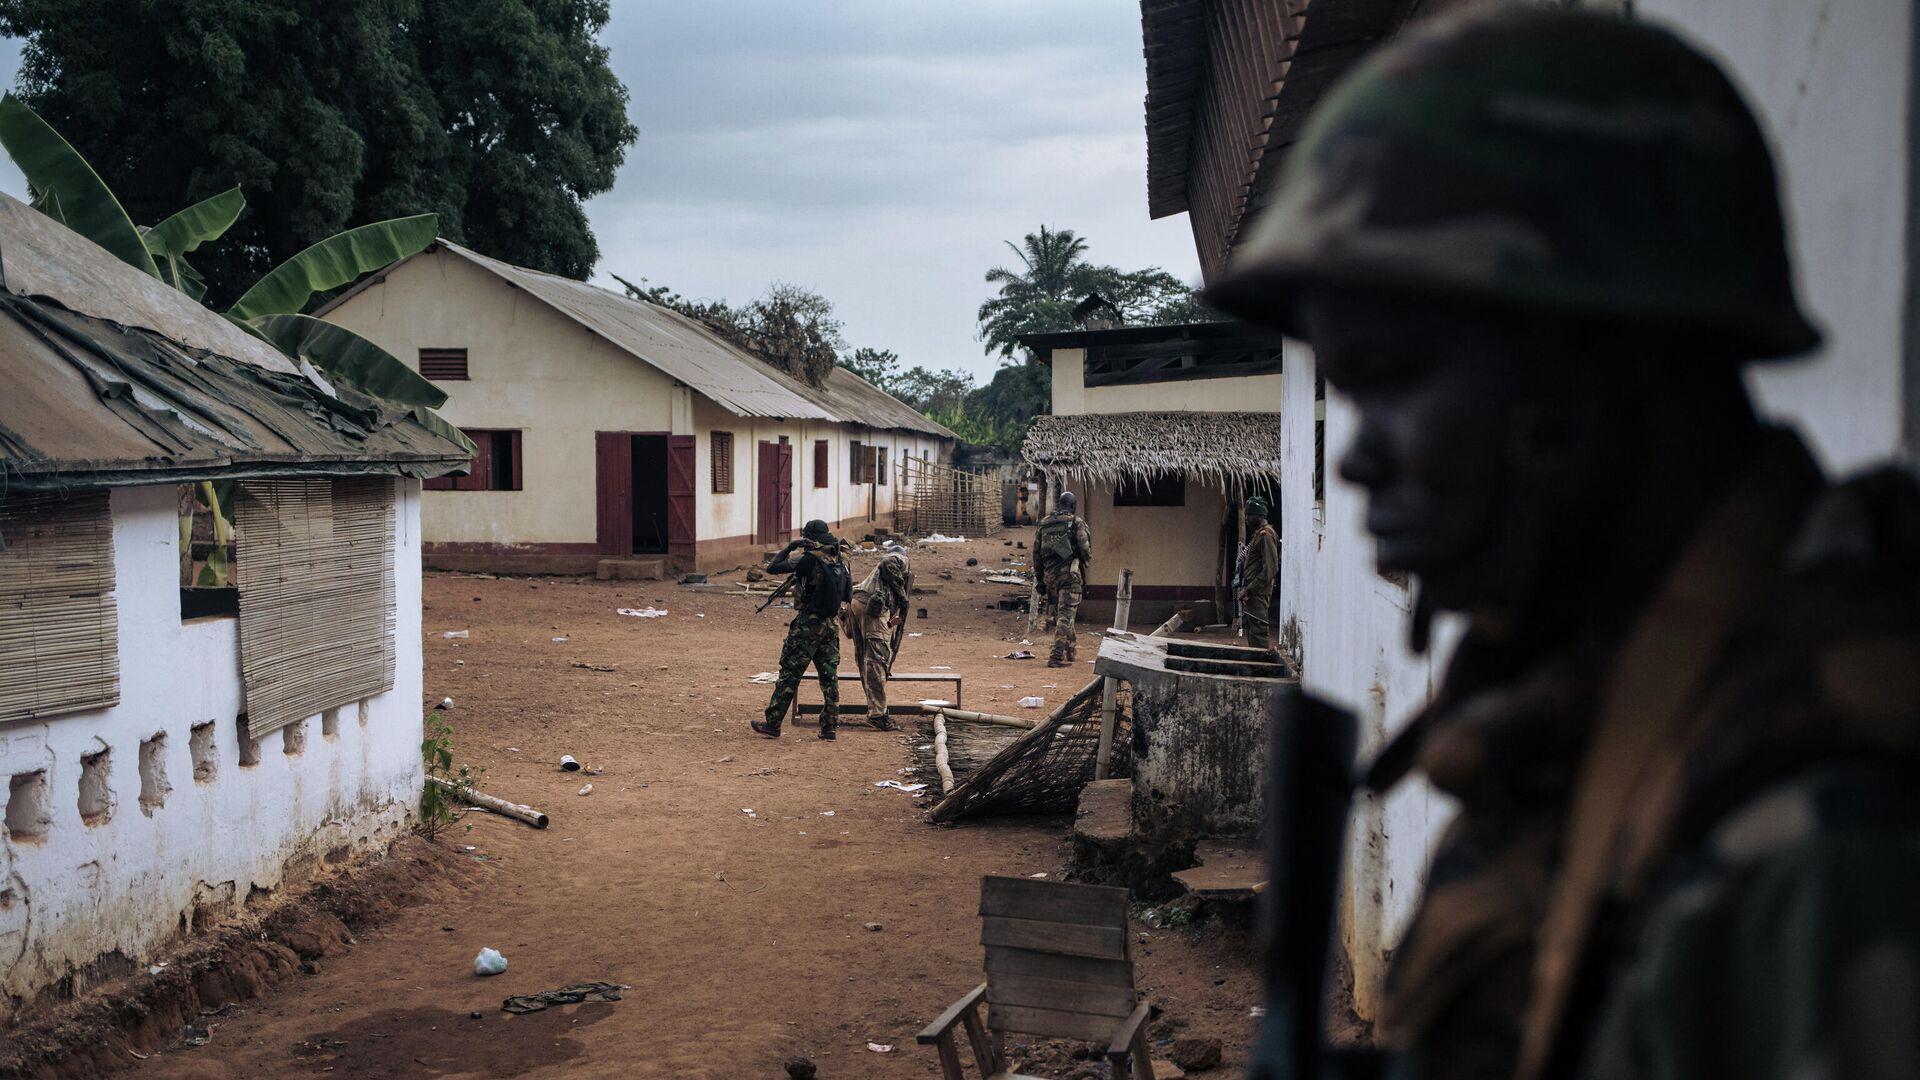 Militares en la República Centroafricana - Sputnik Mundo, 1920, 01.04.2021